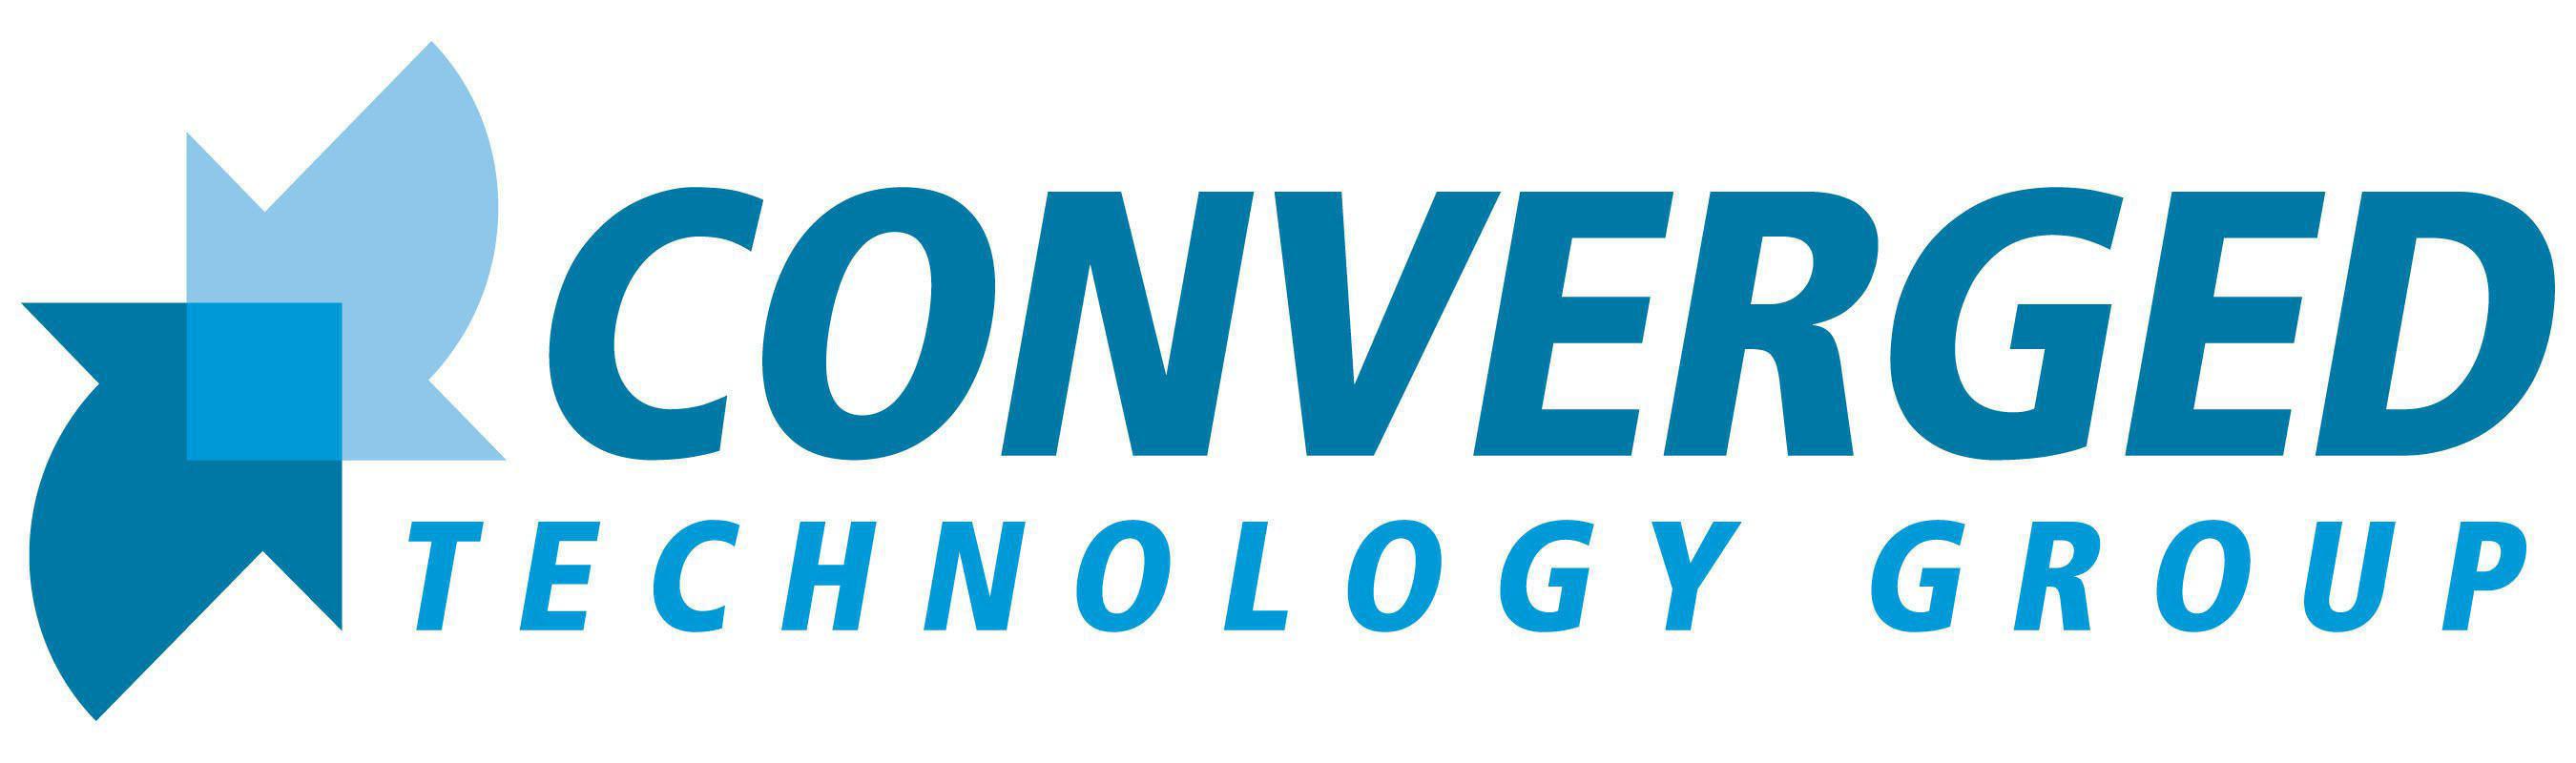 Converged Technology Group IDs Eight Ways Video Enhances HR Recruitment Efforts